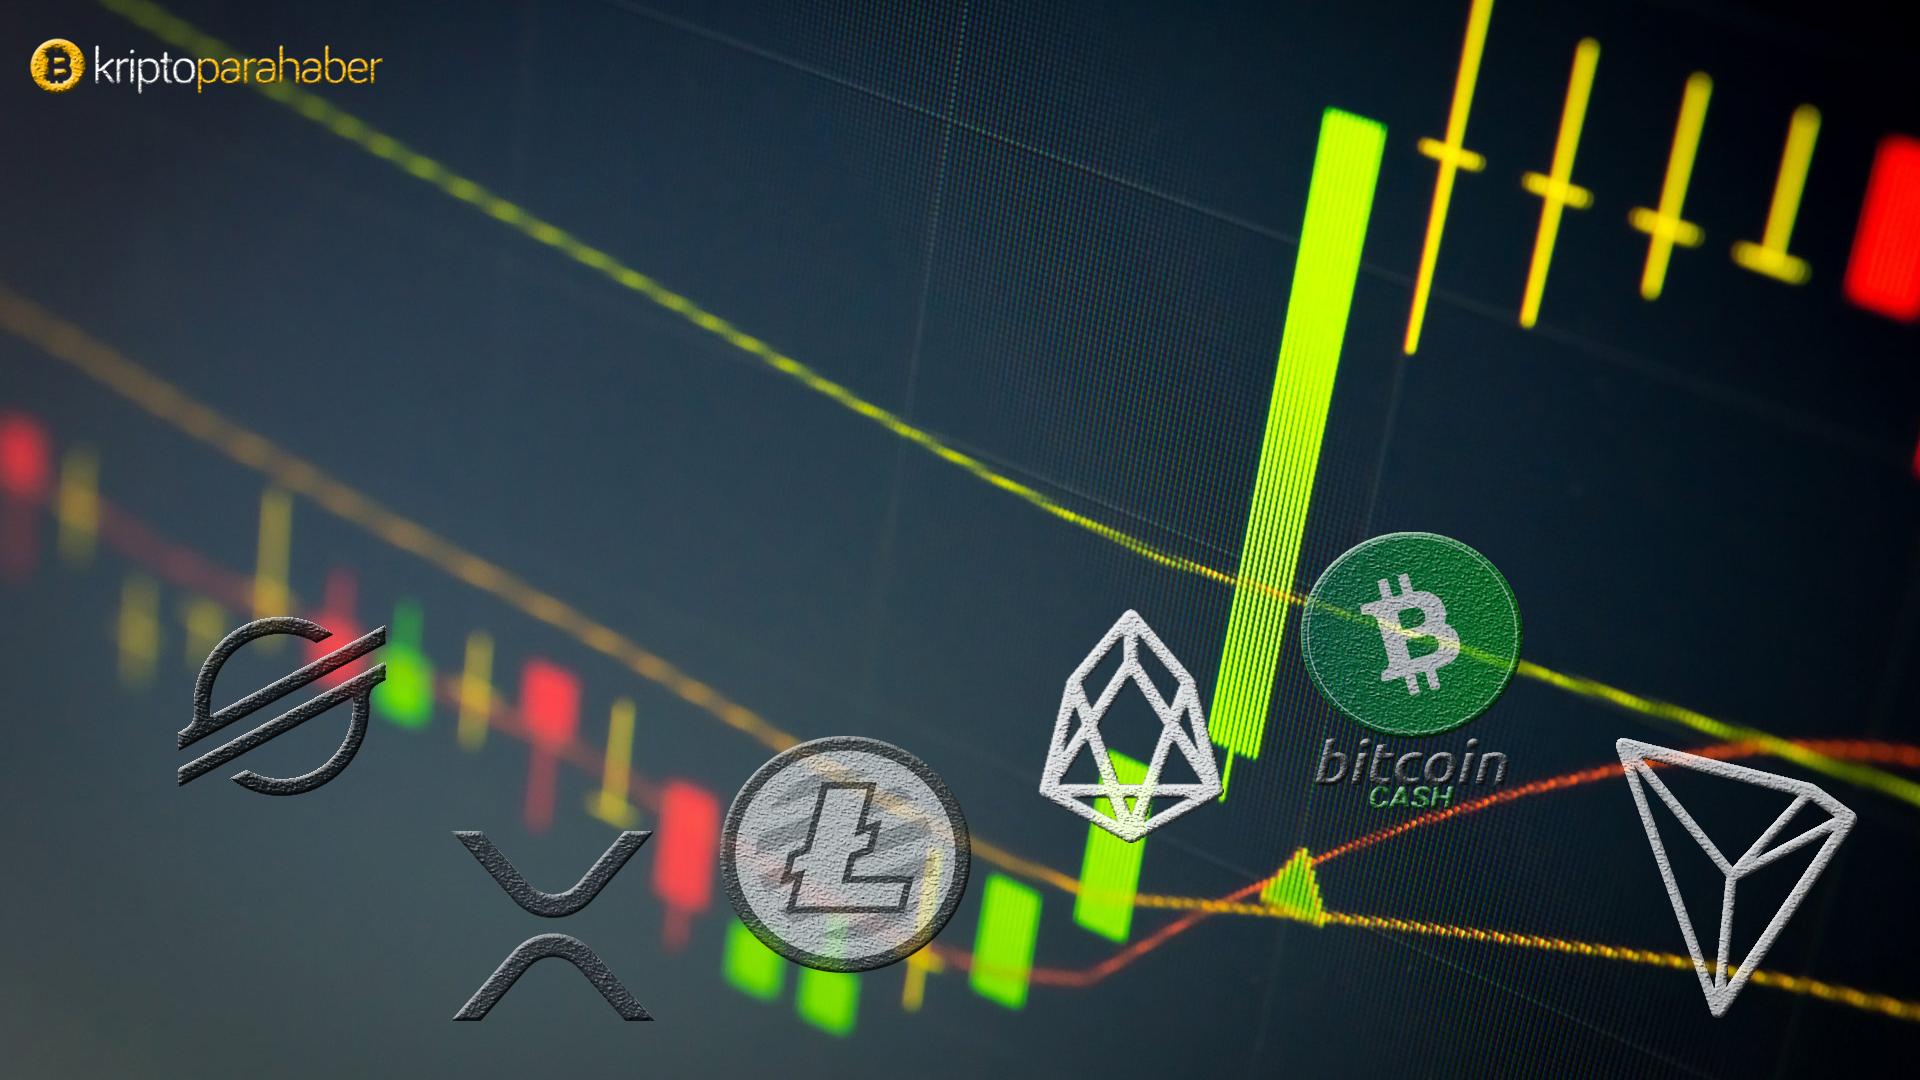 13 Ekim Bitcoin Cash (BCH) ve Tezos (XTZ) fiyat analizi